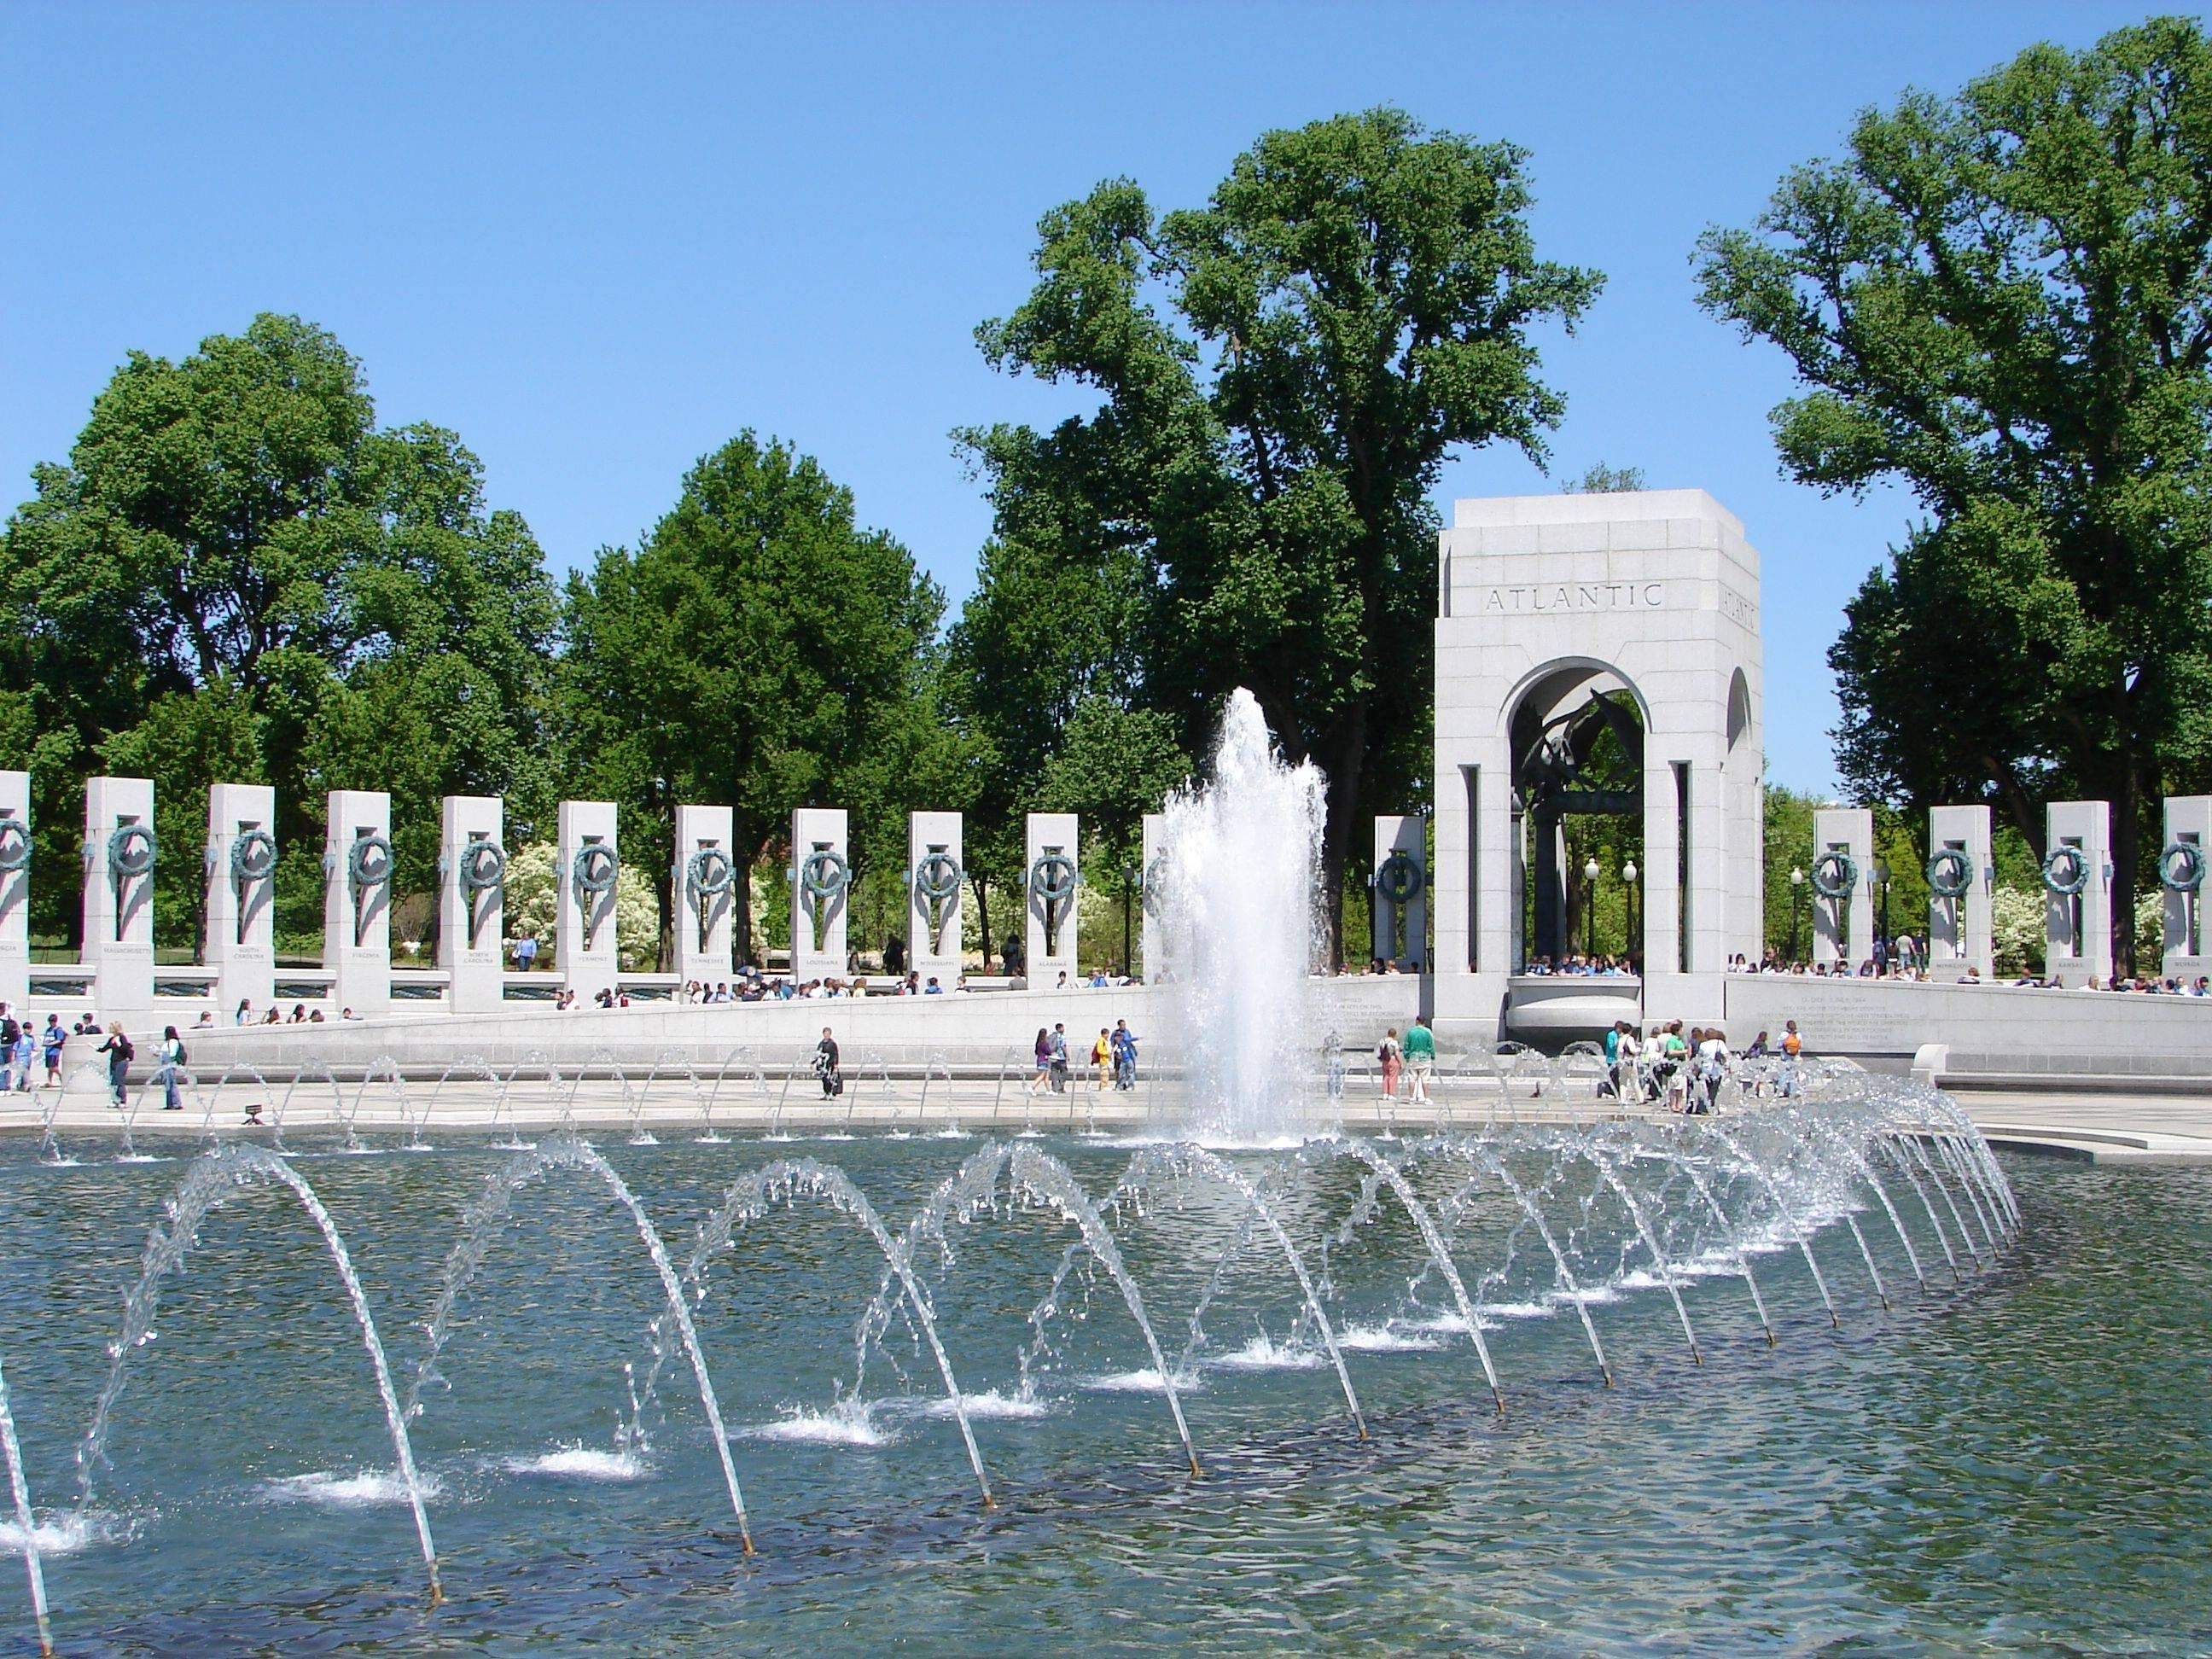 photos of washington dc monuments and memorials national mall